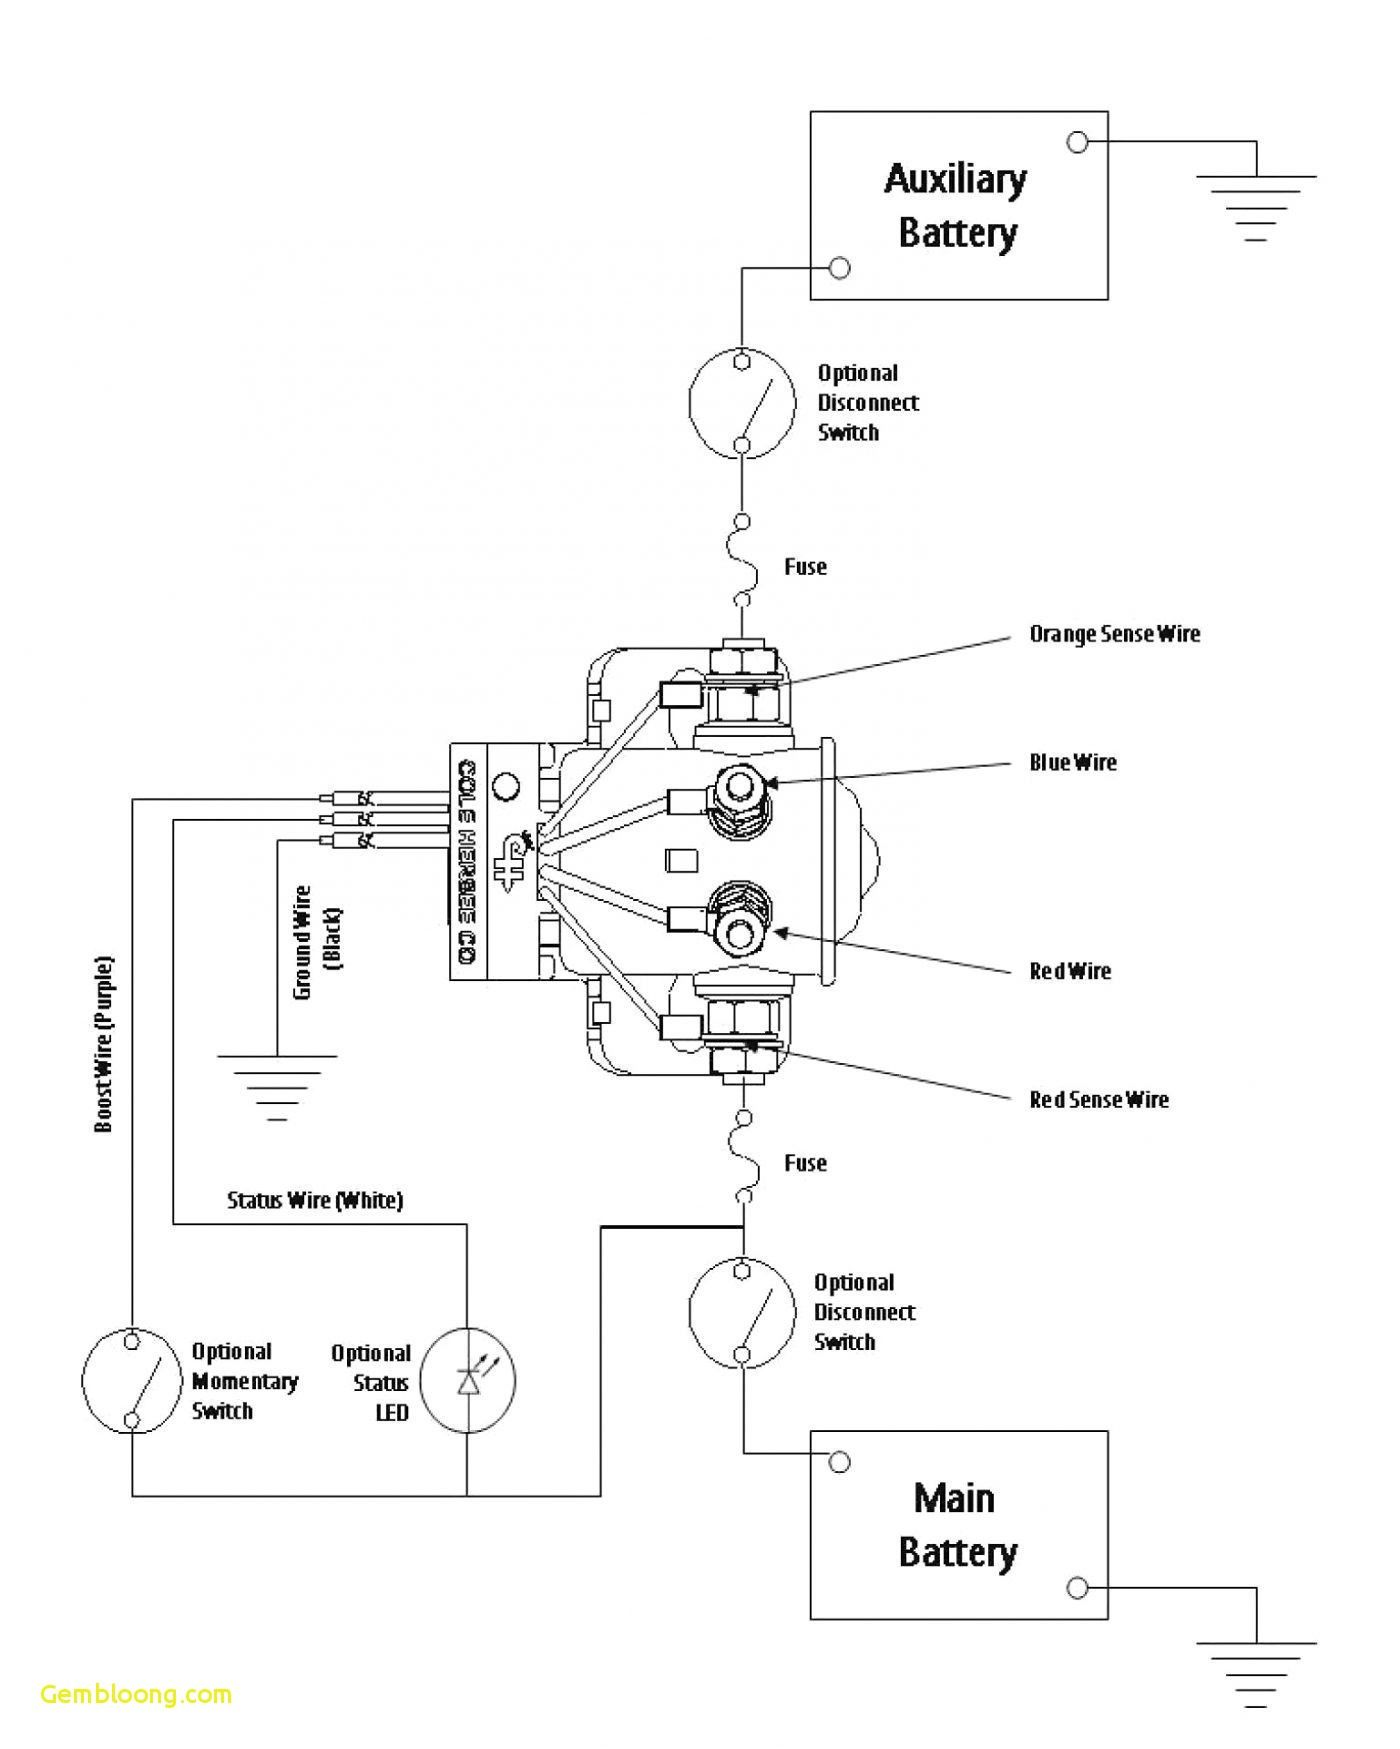 Bmw E46 Coupe Wiring Diagram #diagram #diagramtemplate #diagramsample |  BaldorPinterest